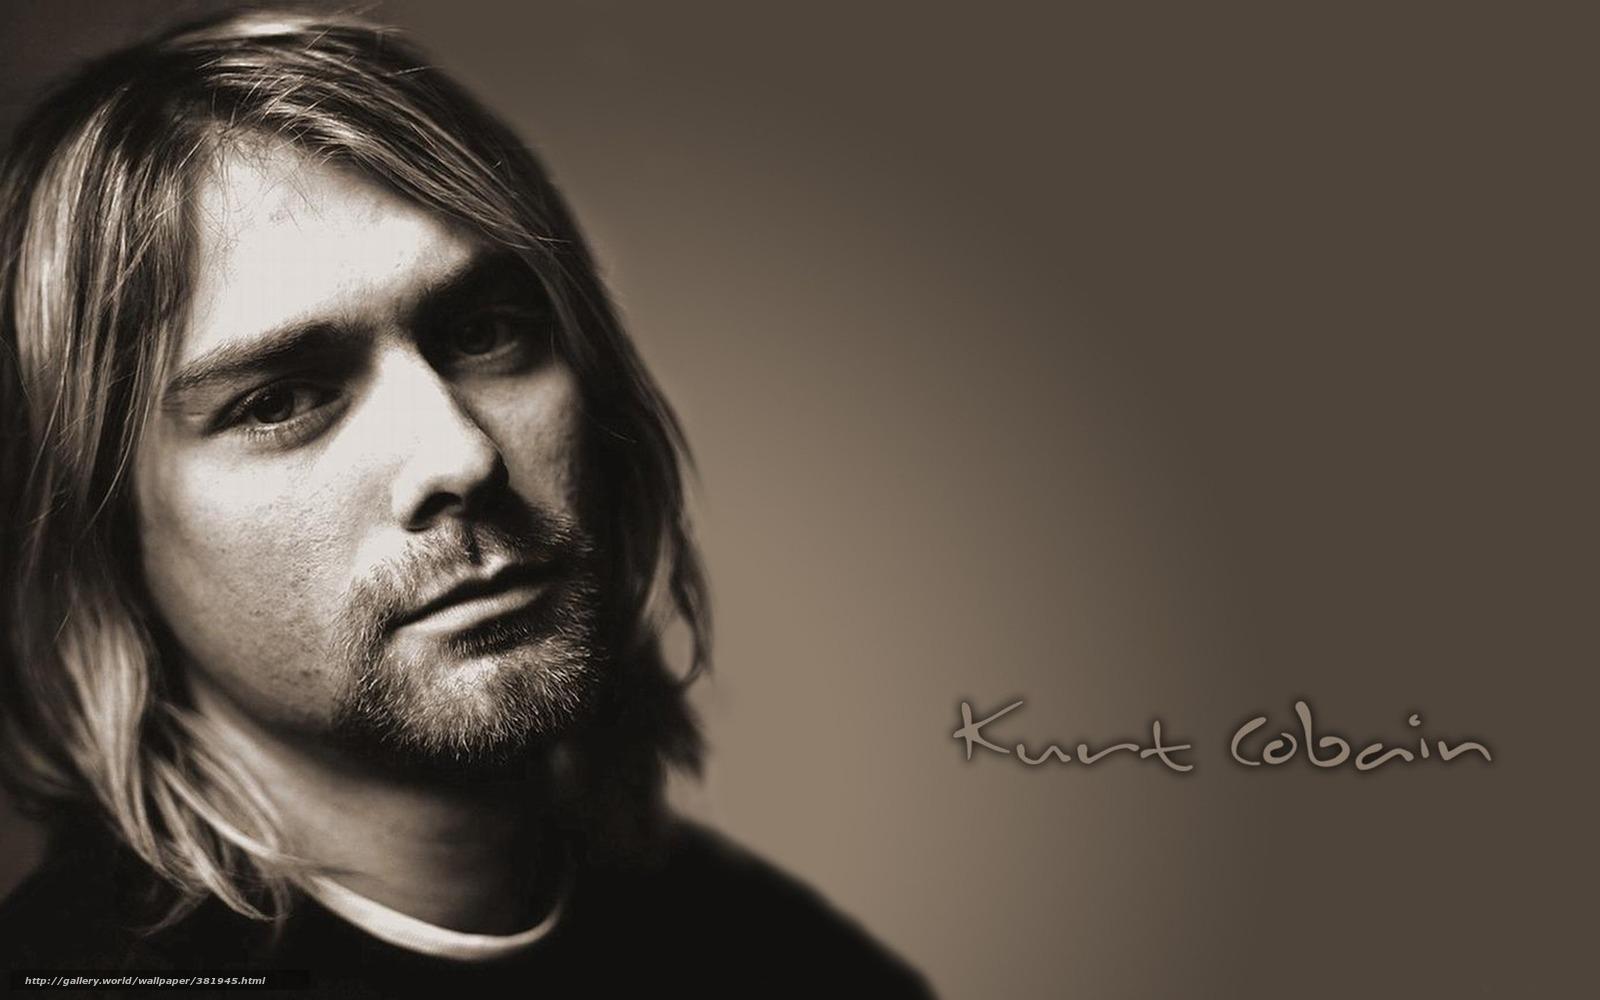 Tlcharger Fond d'ecran nirvana, Kurt Donald Cobain, Musique, papier peint Fonds d'ecran gratuits ...